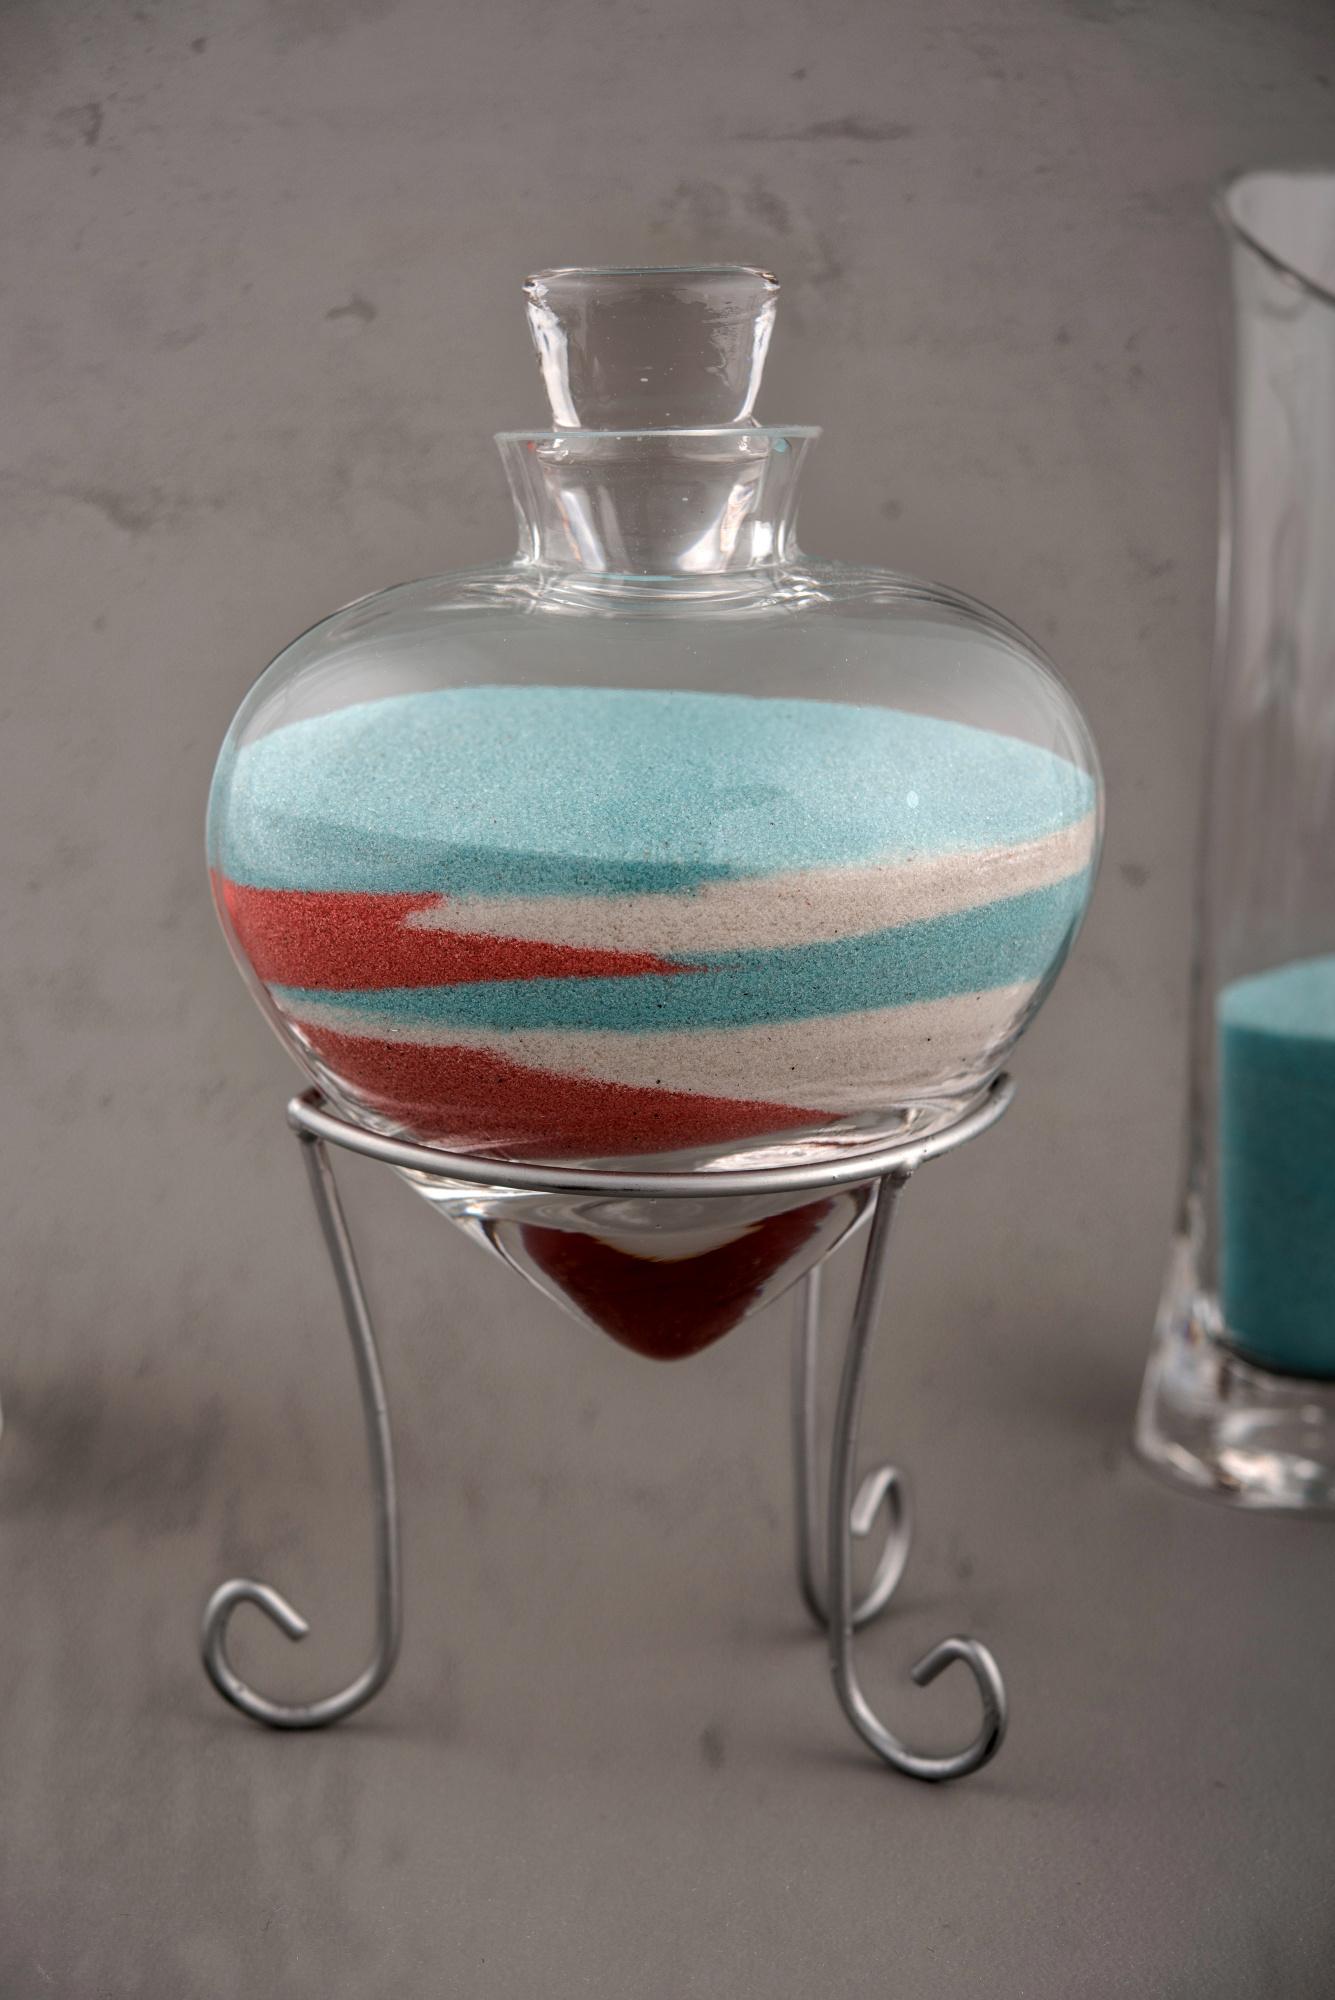 Decorative sand for sand ceremonies vases 500 gram pack many decorative sand for sand ceremonies vases 500 gram reviewsmspy